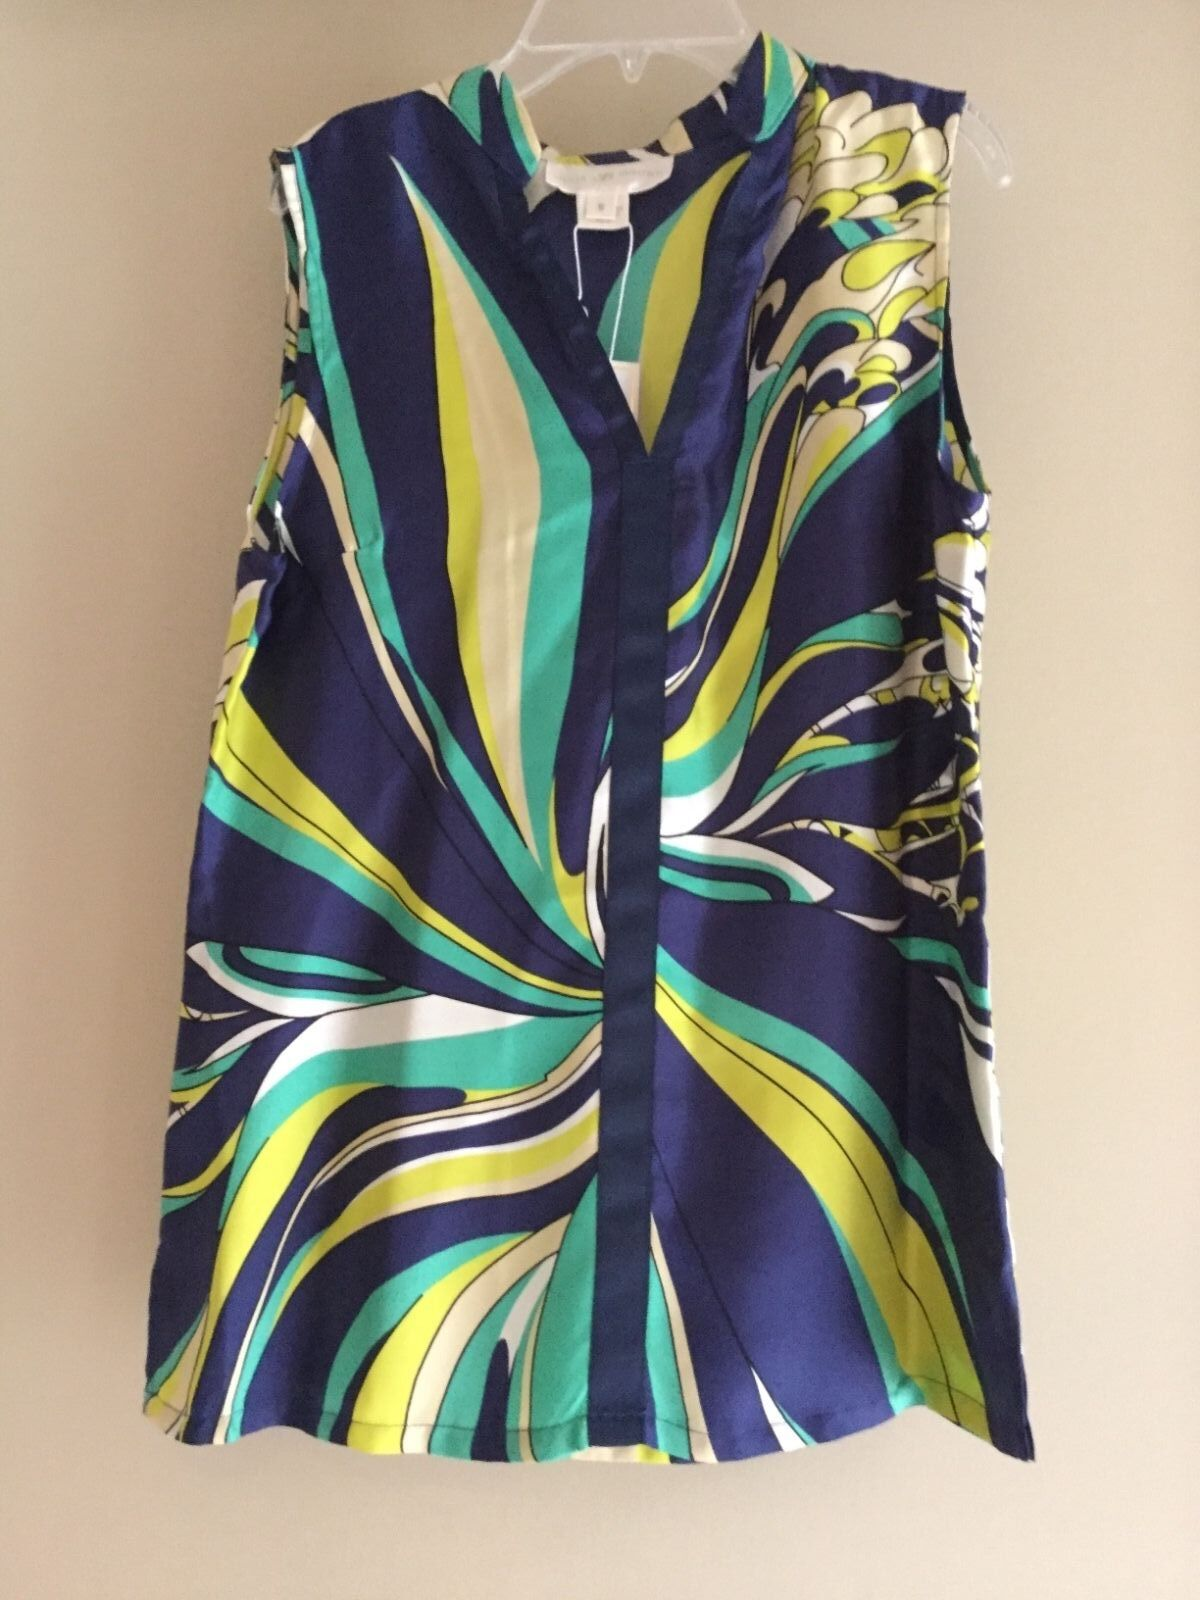 Julie braun Silk sleeveless Mock neck Navy Sea Star top blouse NEW w tags